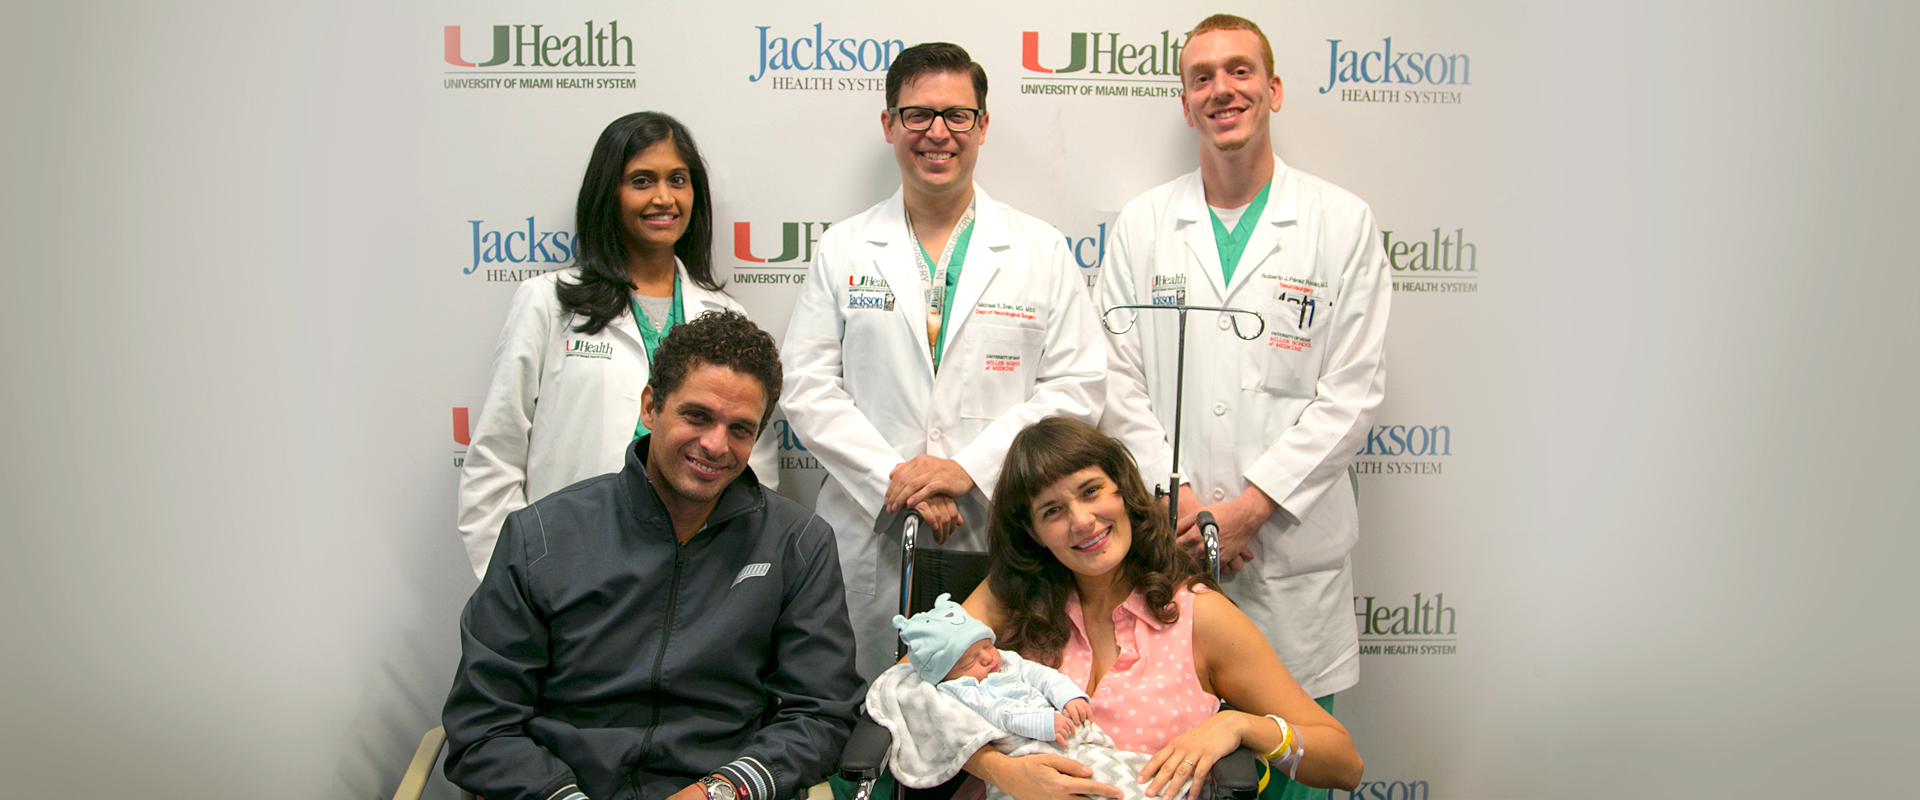 Maria Peña Press Conference full team of surgeons